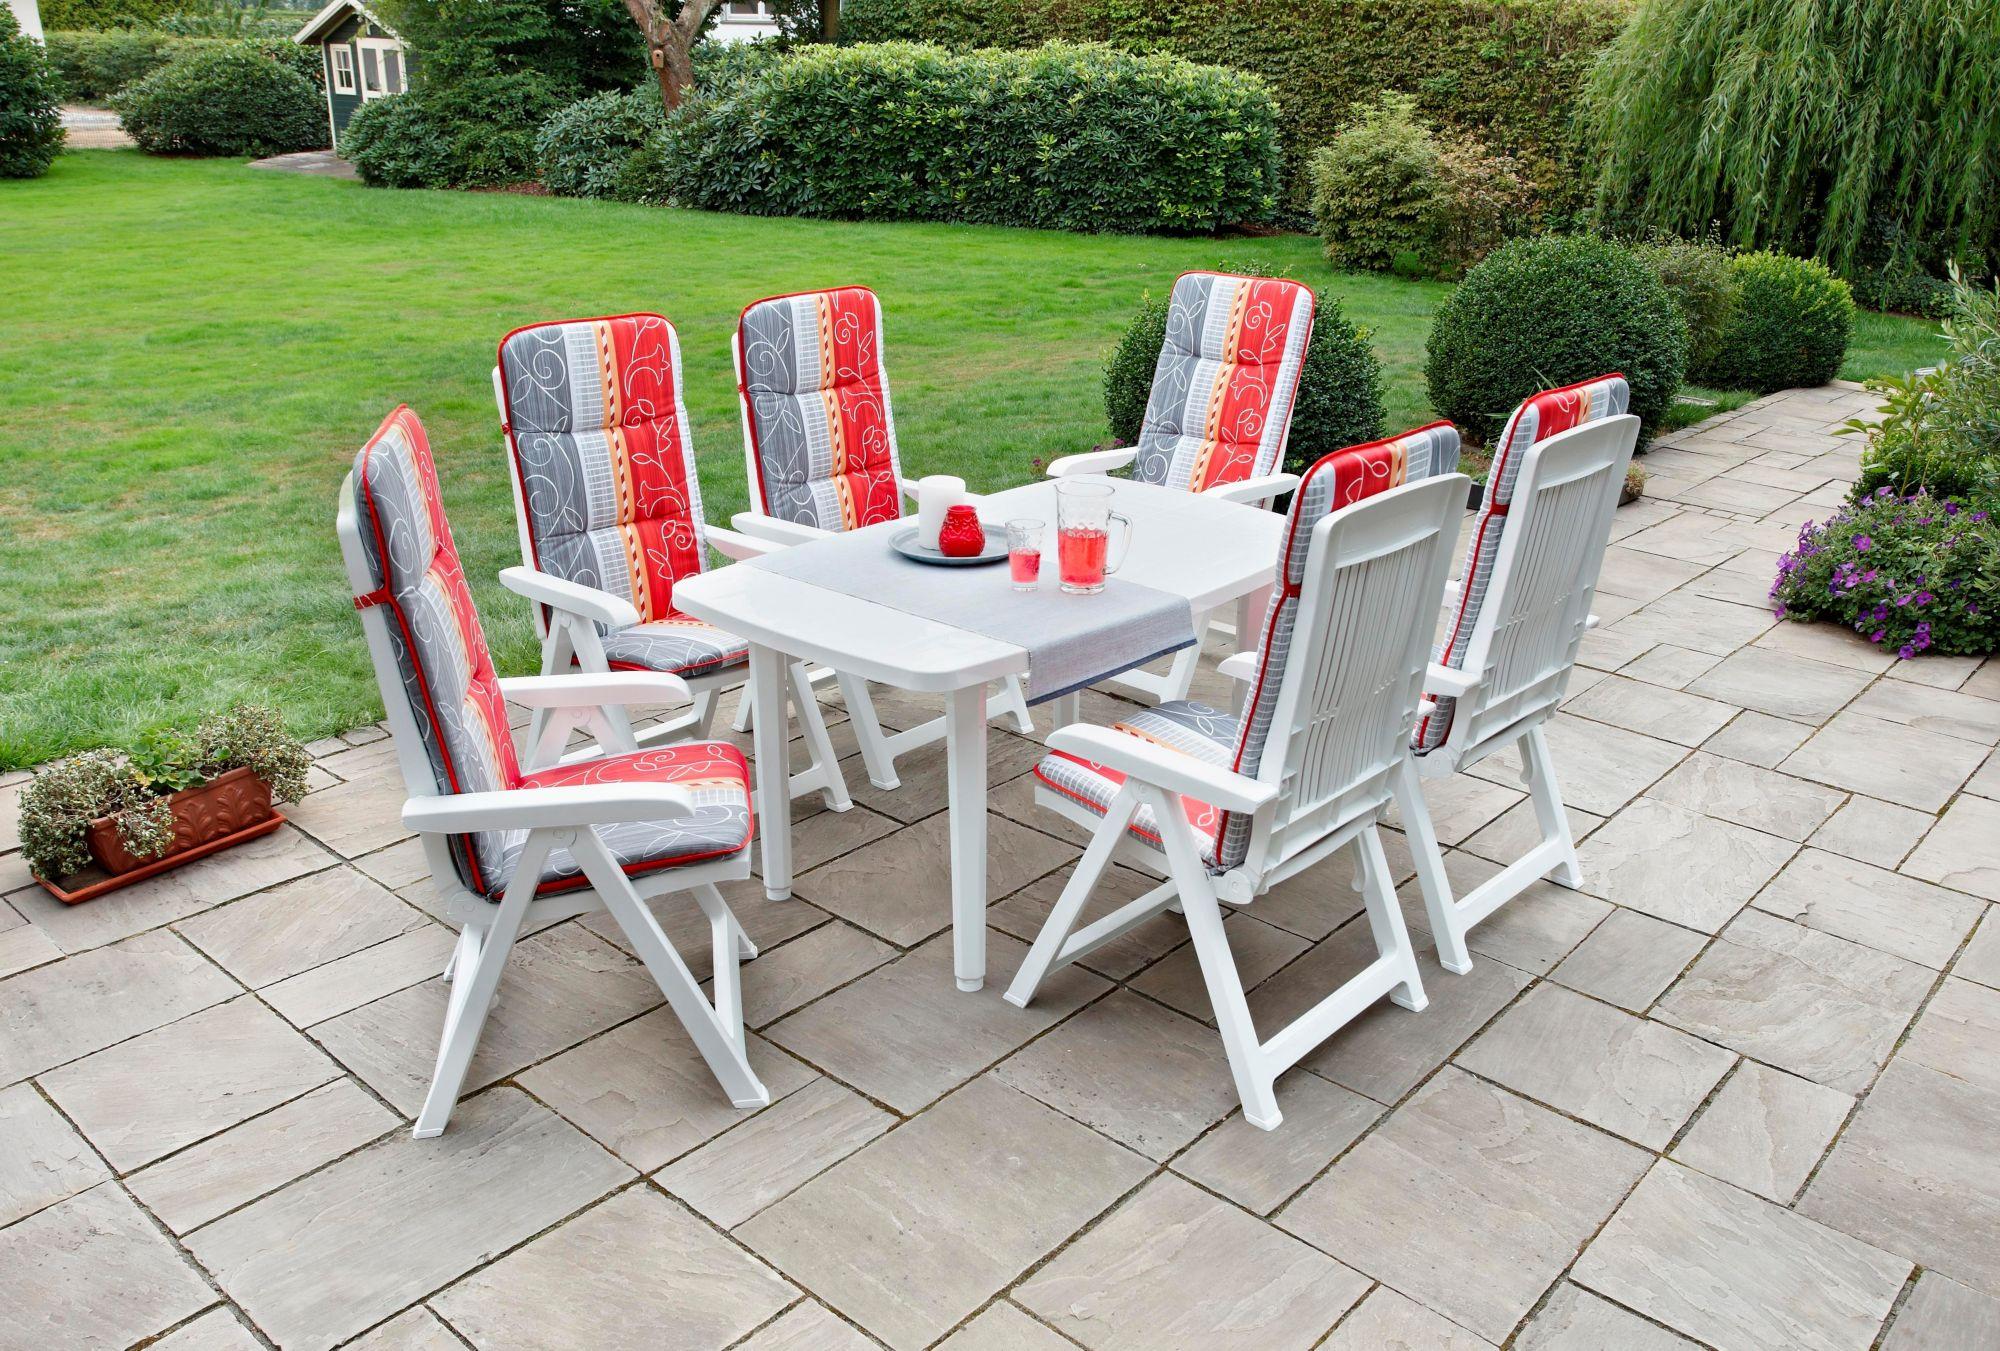 BEST Best 13-tgl. Gartenmöbelset »Kopenhagen«,6 Sessel,Tisch 140x85 cm,Kunststoff,weiß,inkl. Auflagen,klappbar